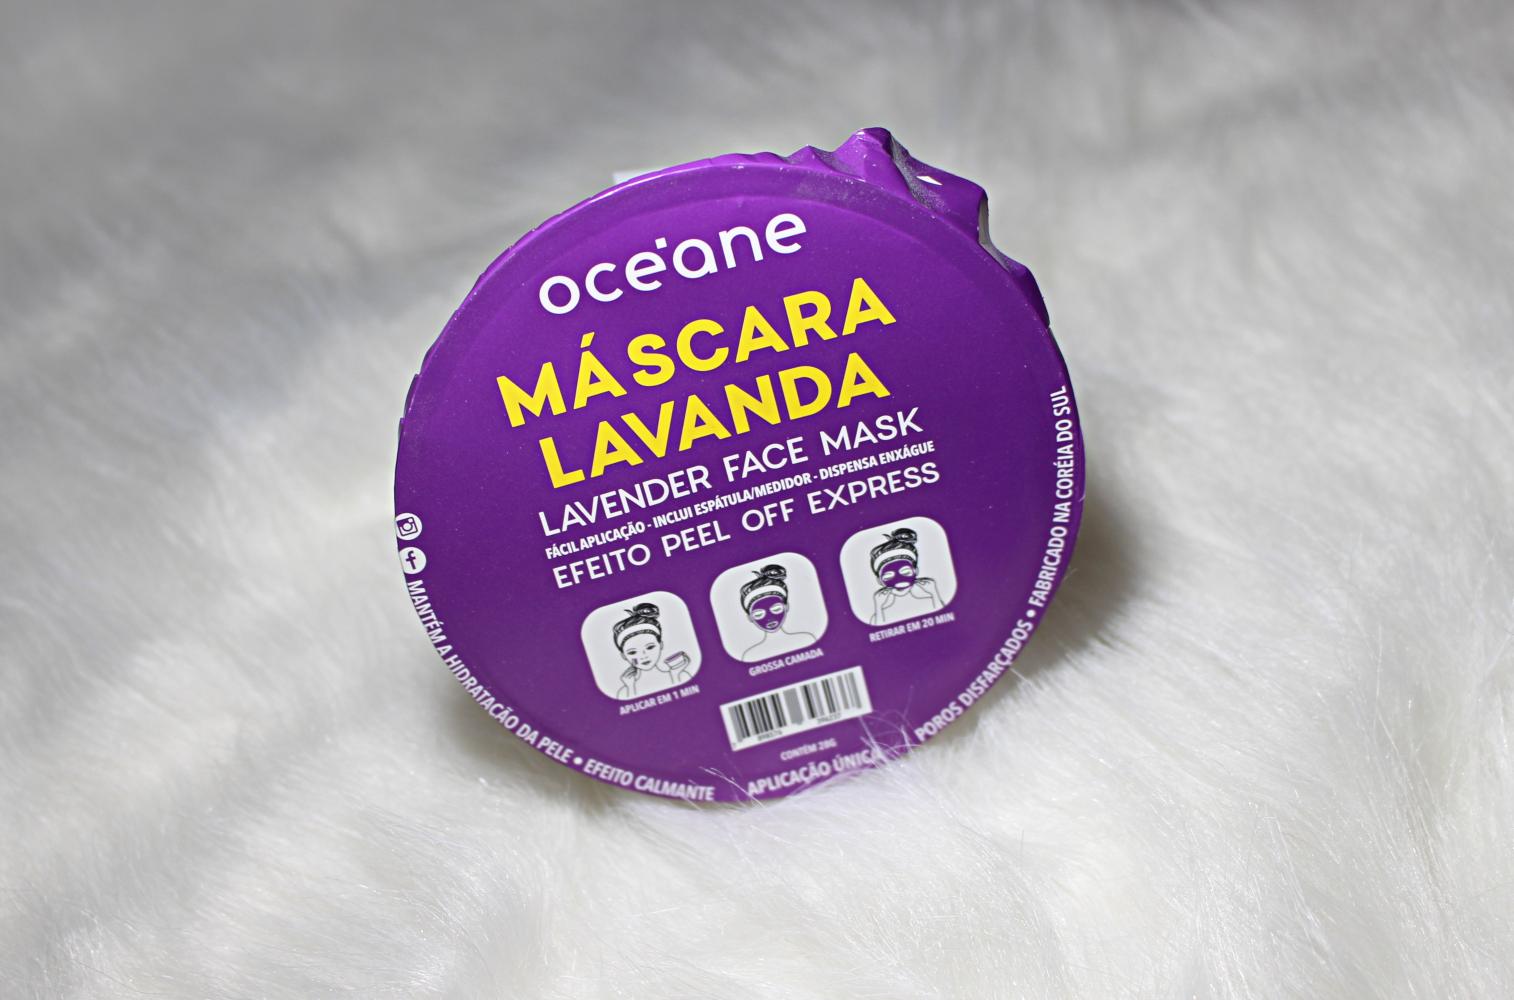 Ocèane lavanda mascara resenha